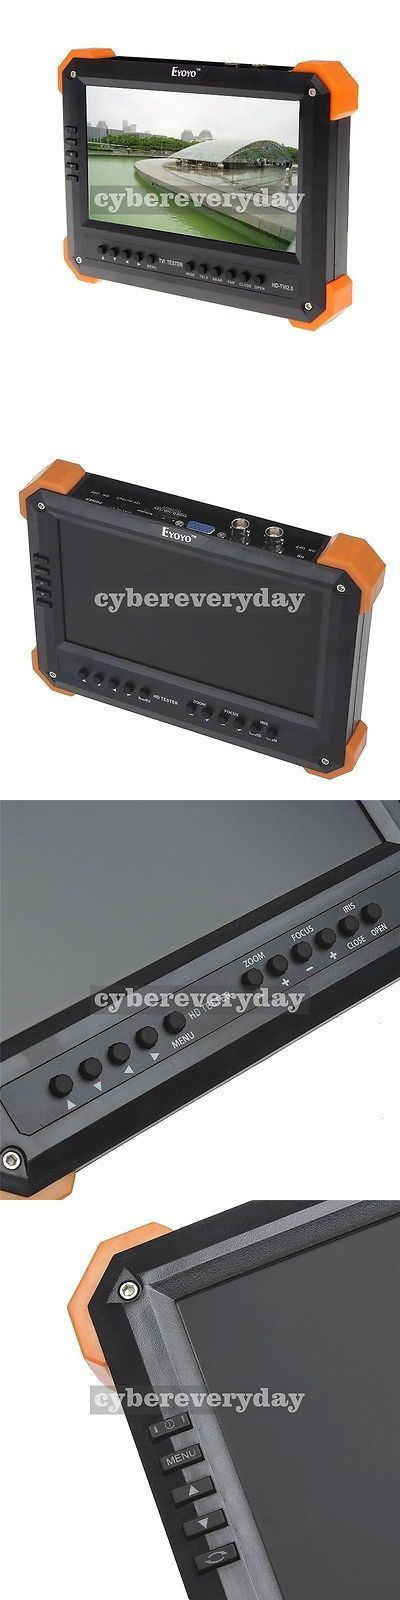 Surveillance Monitors Displays: X41ta 7 Lcd Monitor Hd-Tvi 3.0+Ahd+Hdmi+Vga+Cvbs Camera Test Video Cctv Tester -> BUY IT NOW ONLY: $148.9 on eBay!